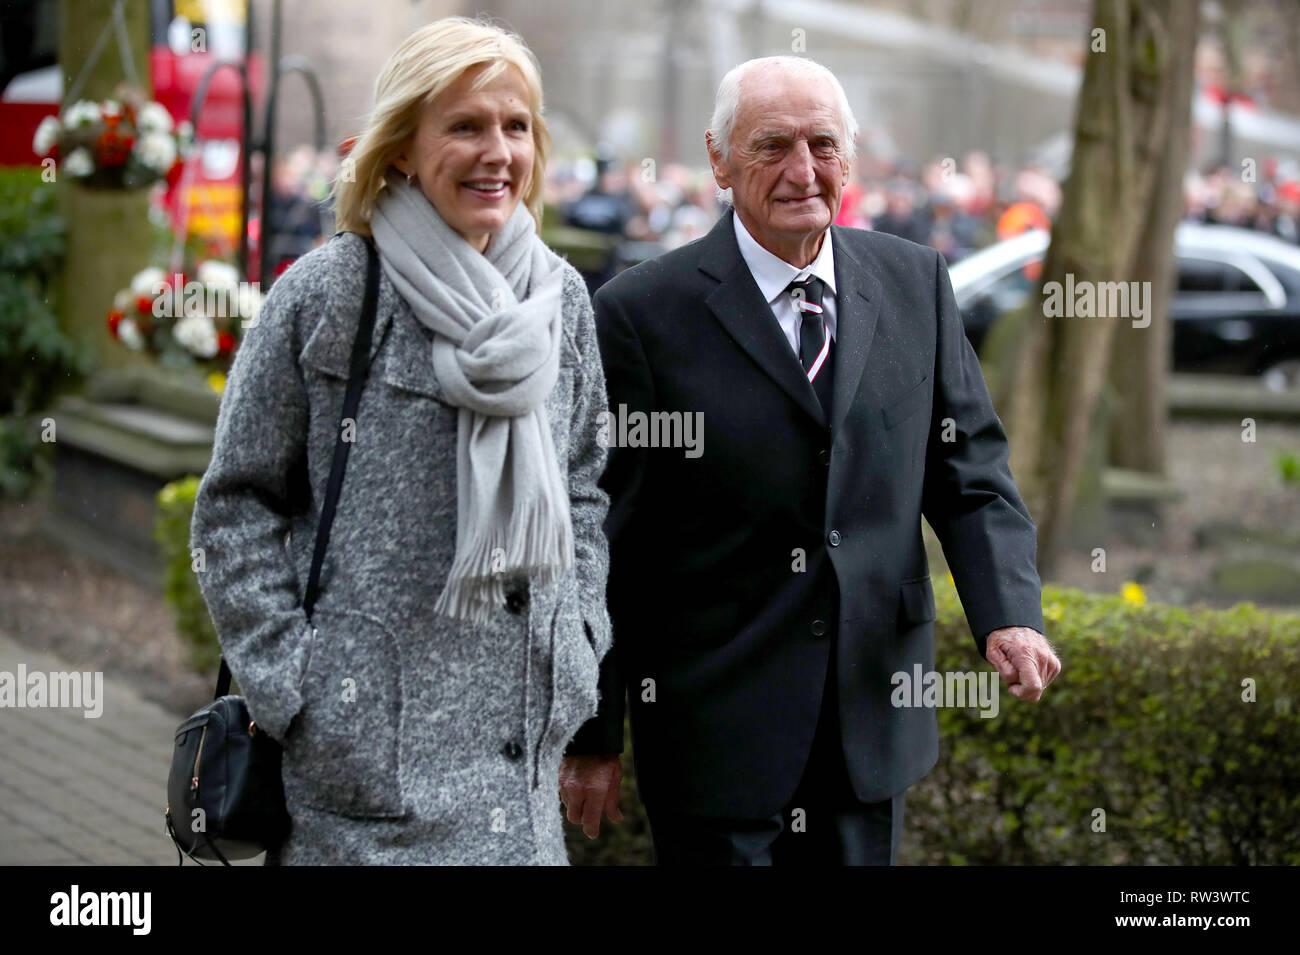 Retired footballer George Eastham arrives for the funeral service for Gordon Banks at Stoke Minster. - Stock Image